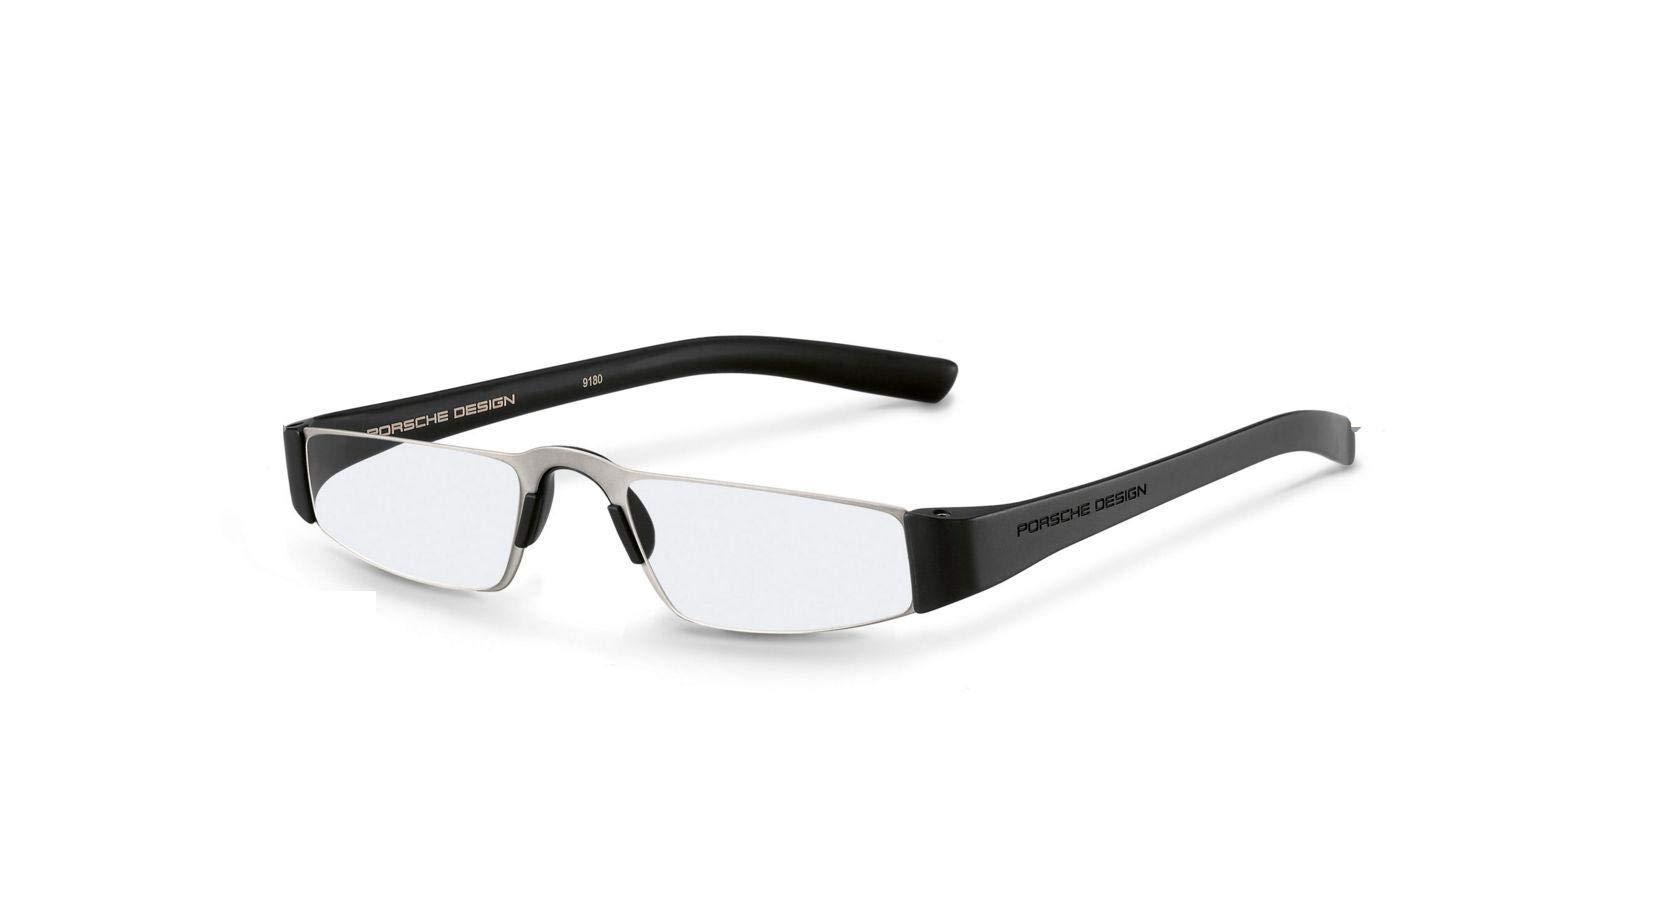 Authentic Porsche Design P 8801 A Silver, Black+1.50 Reading Glasses